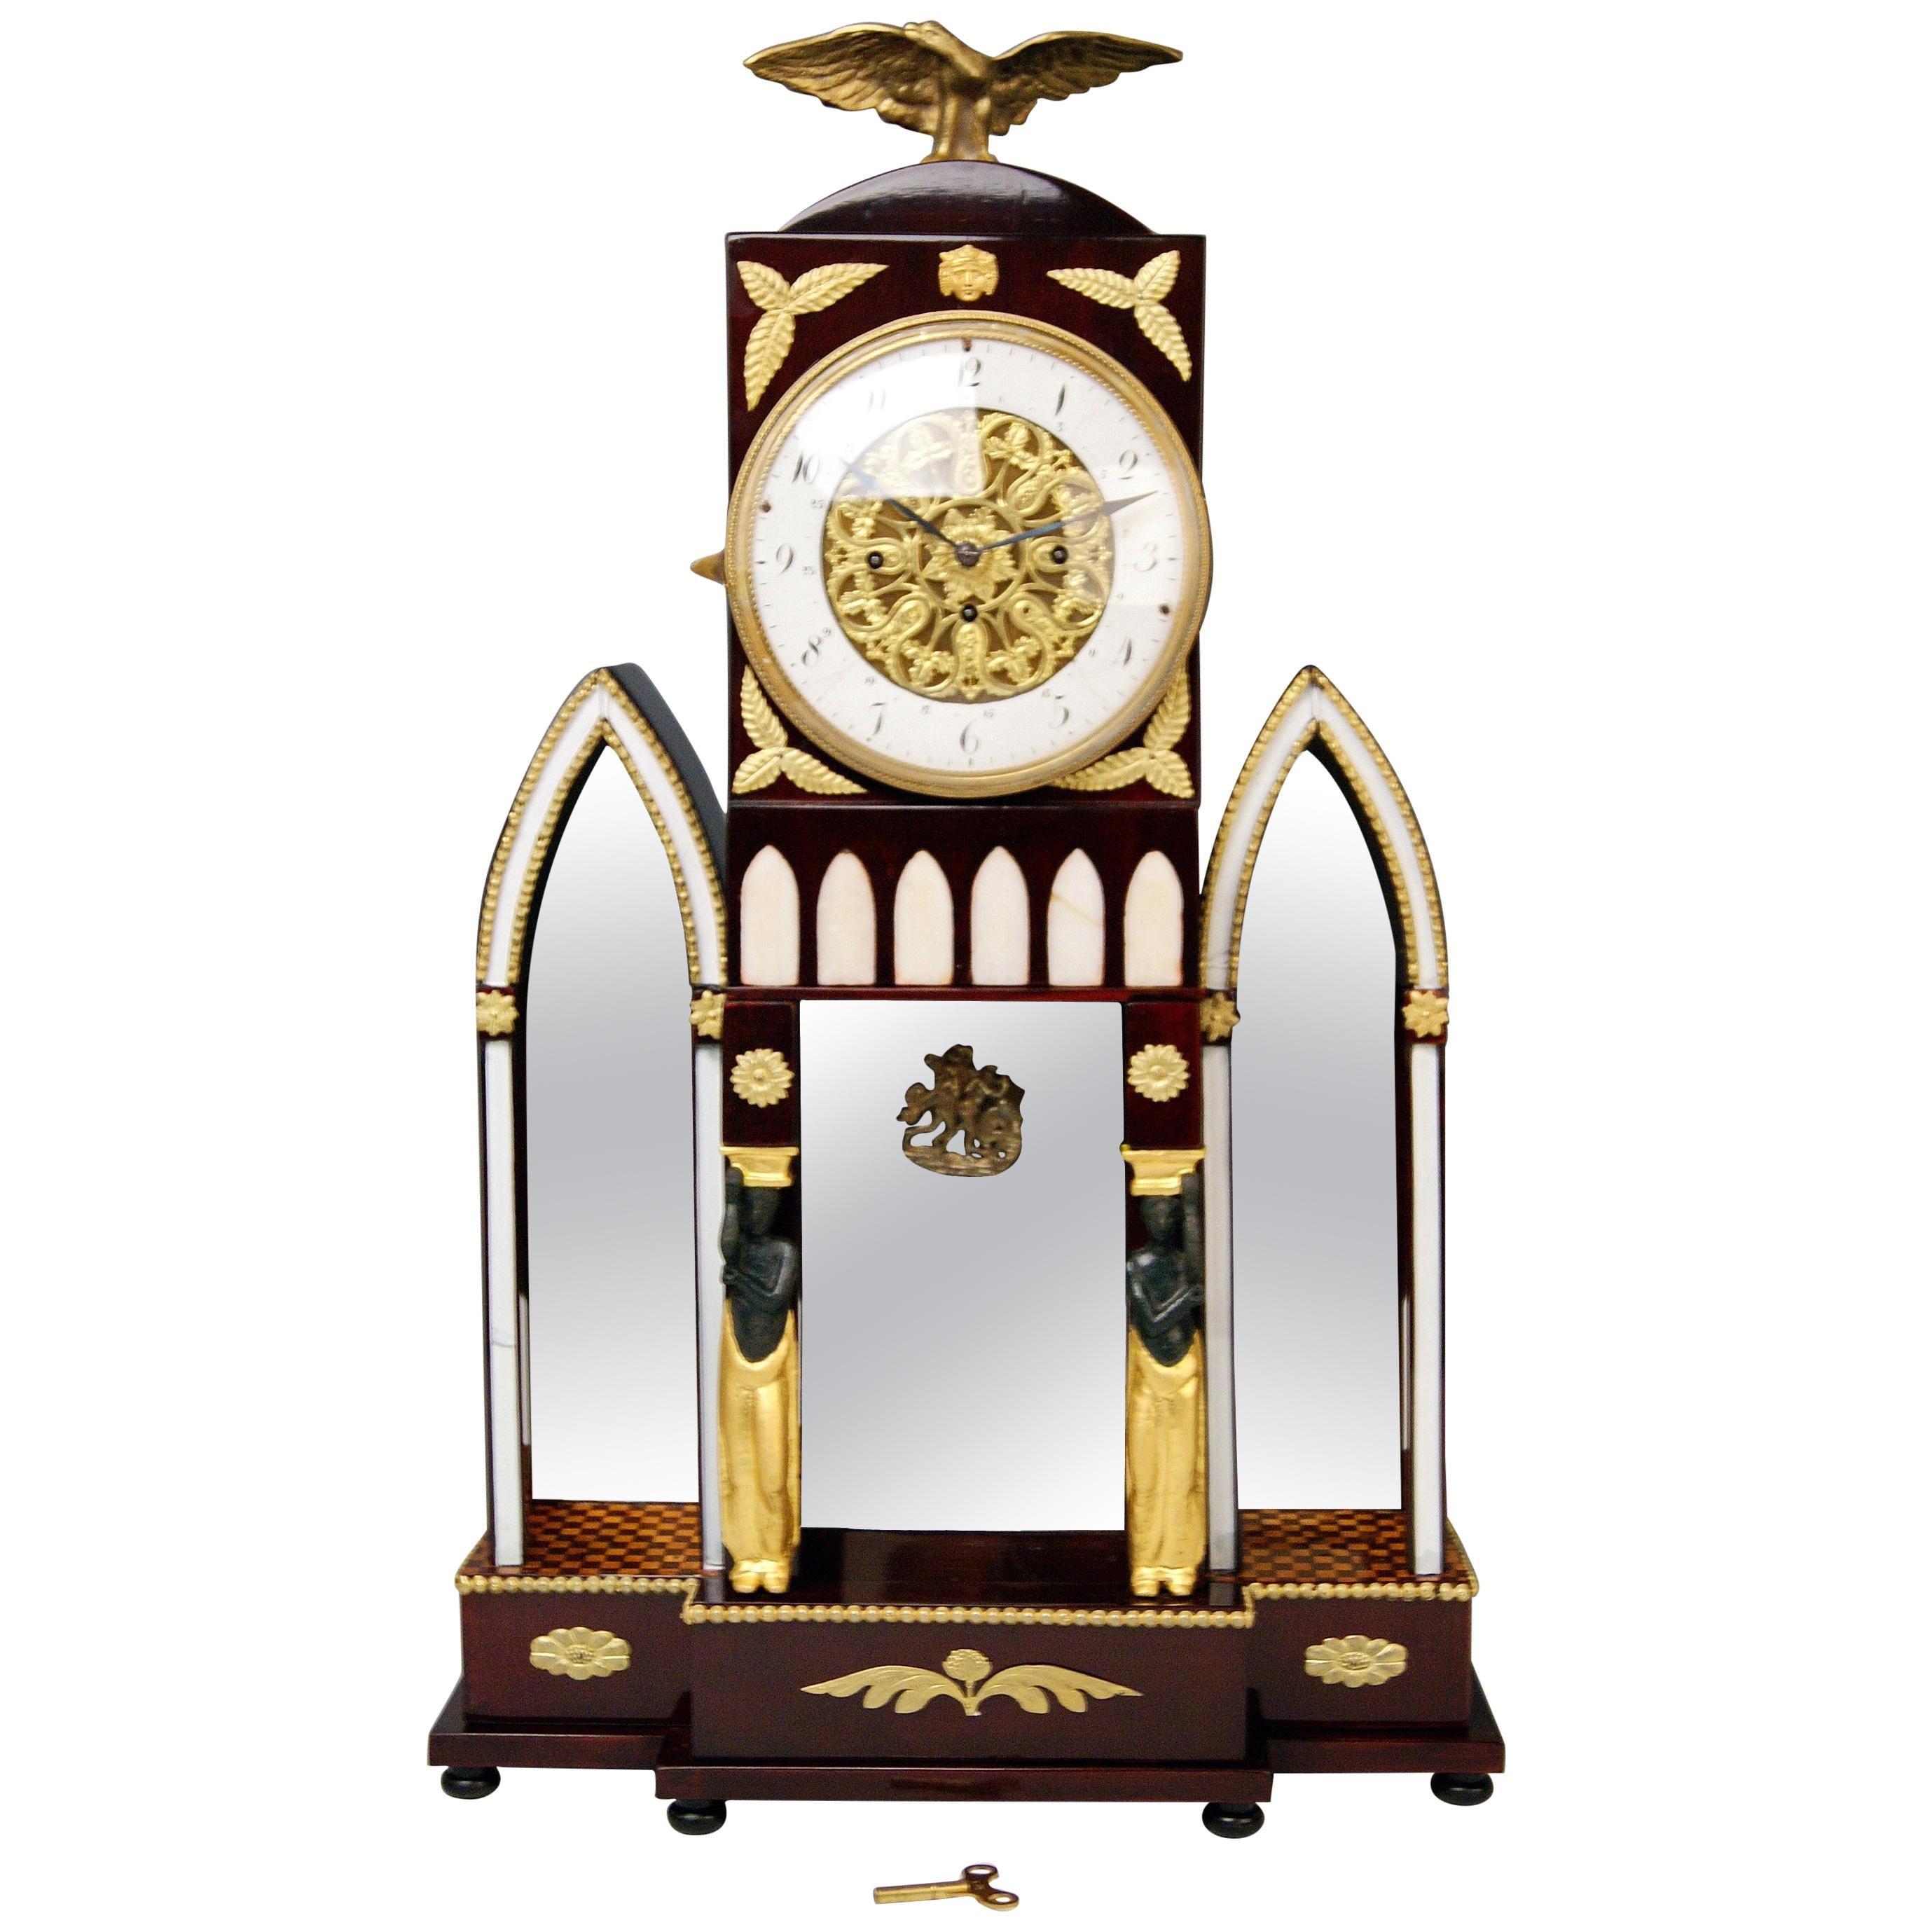 Mantle Mantel Table Chiming Clock Caryatides Empire Austria, Vienna